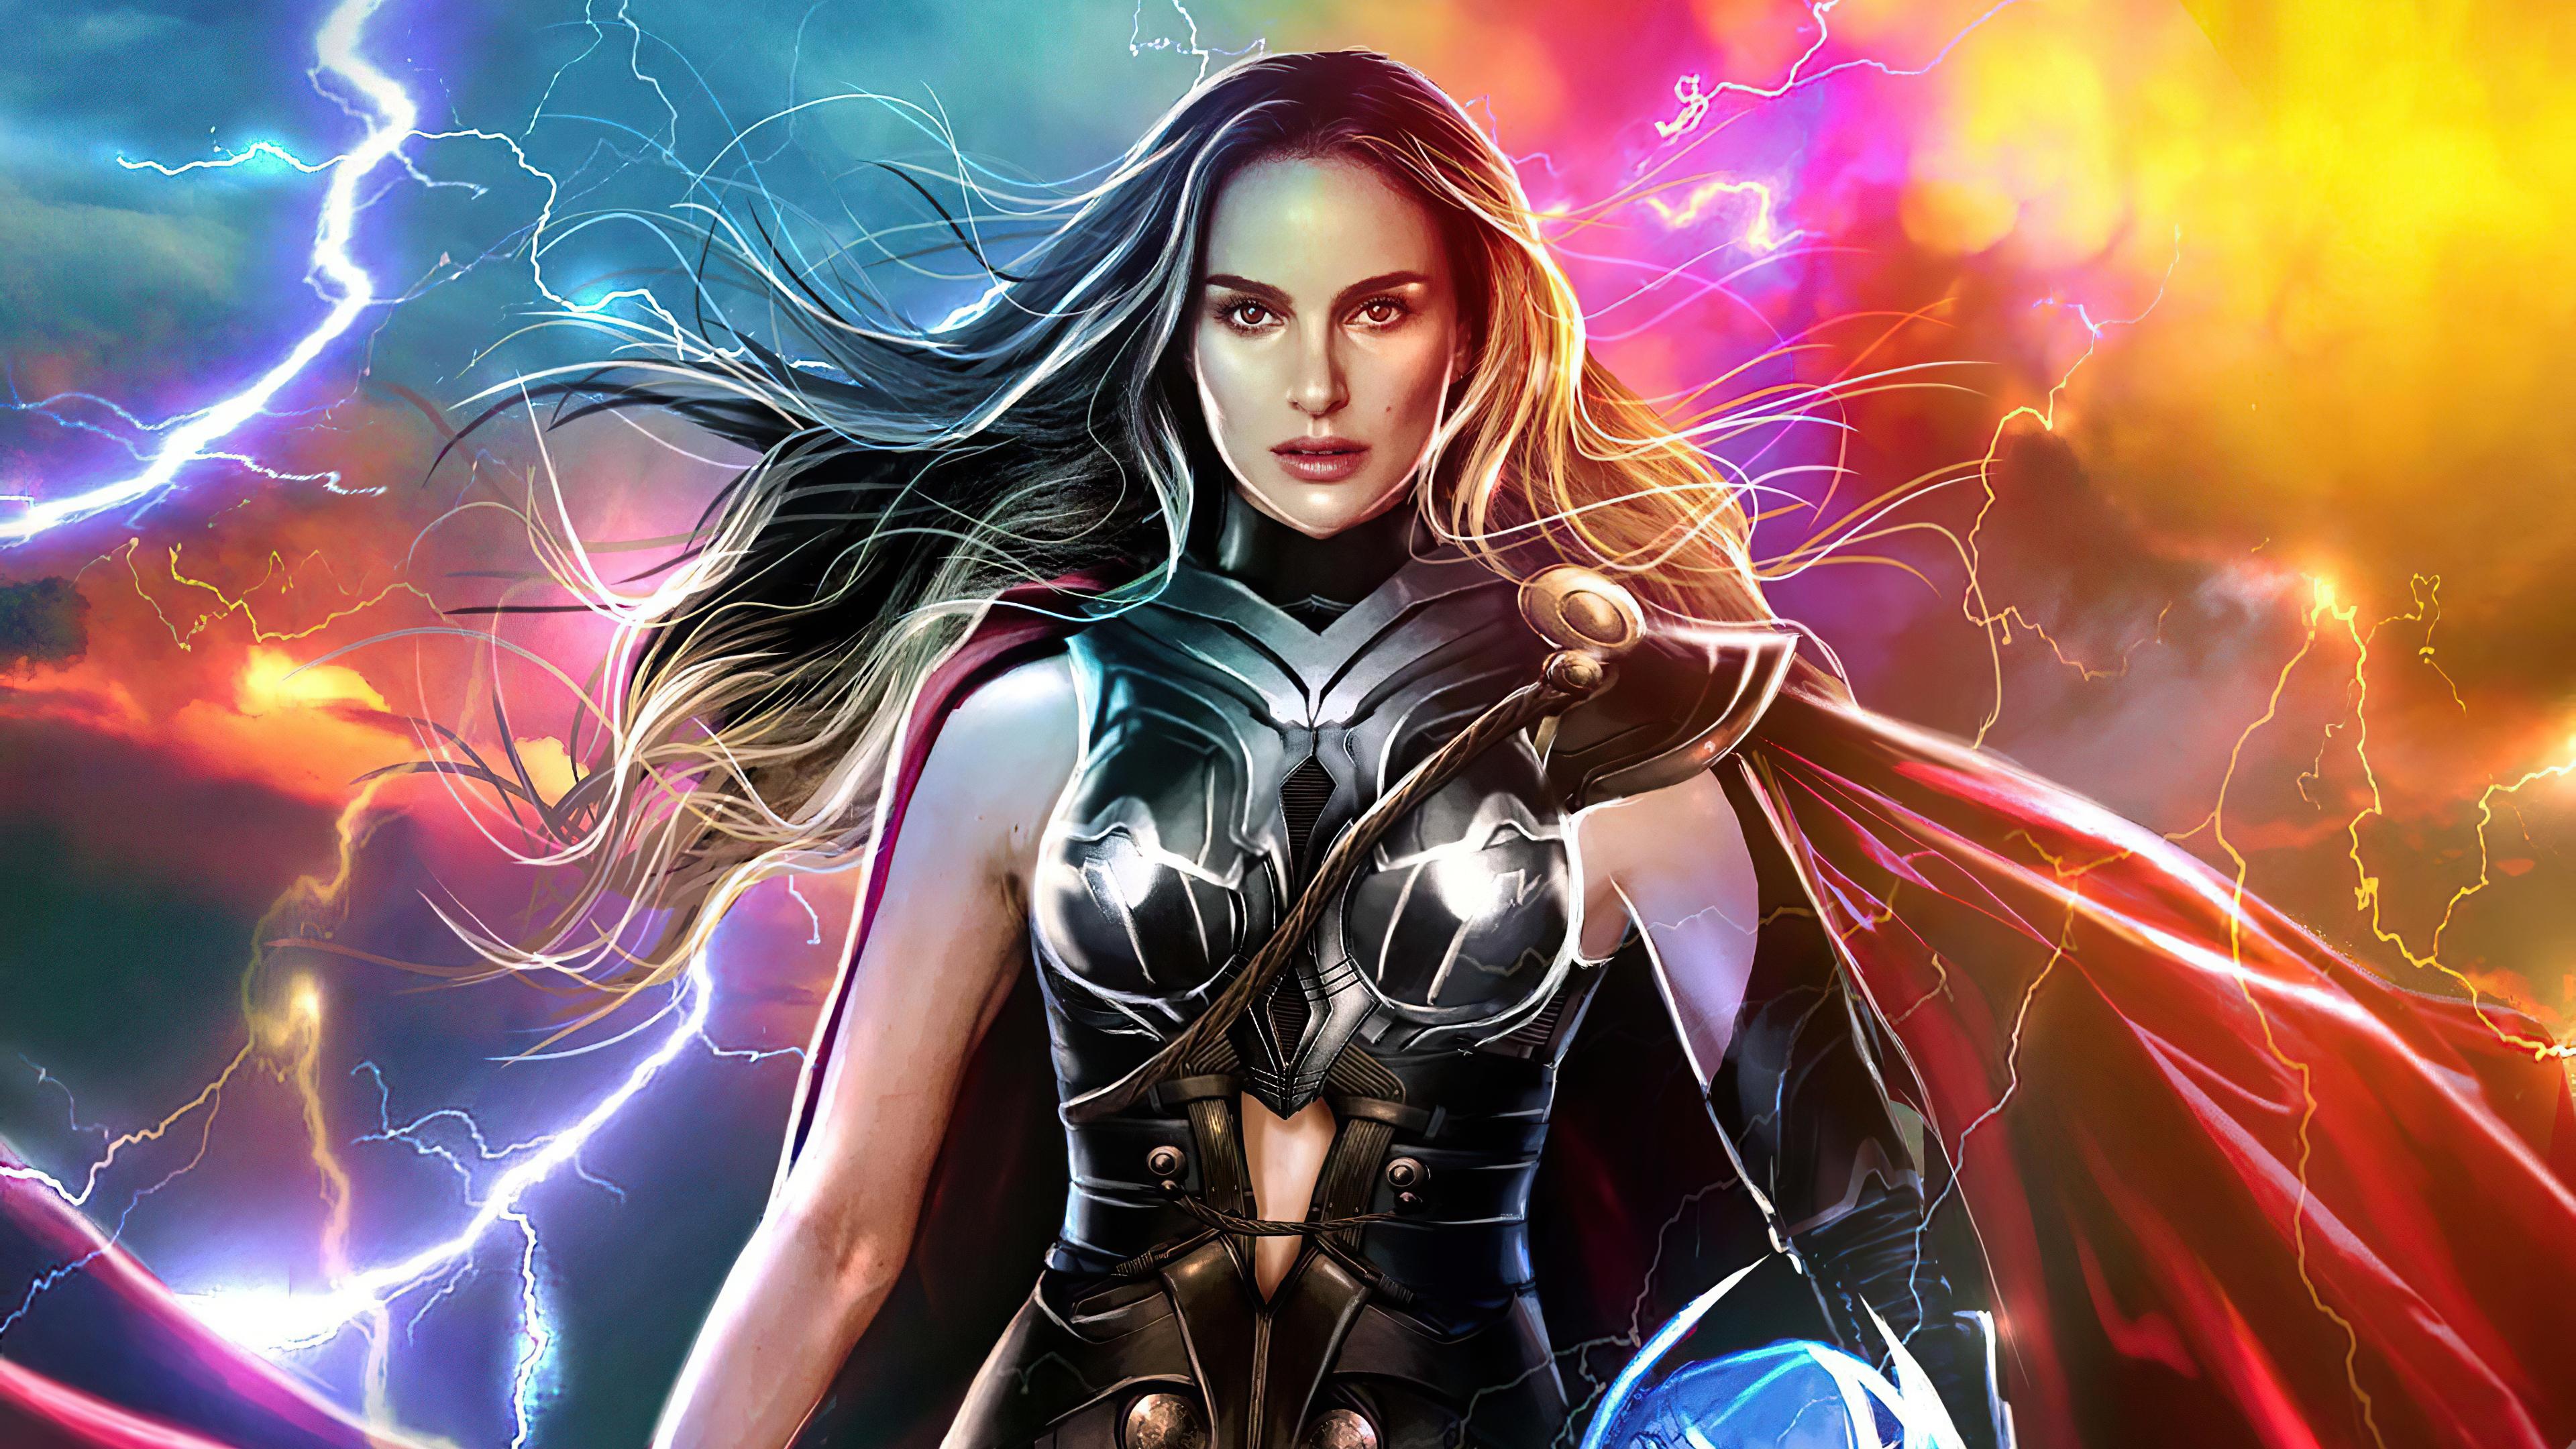 natalie portman lady thor 1602351925 - Natalie Portman Lady Thor - Natalie Portman Lady Thor 4k wallpapers